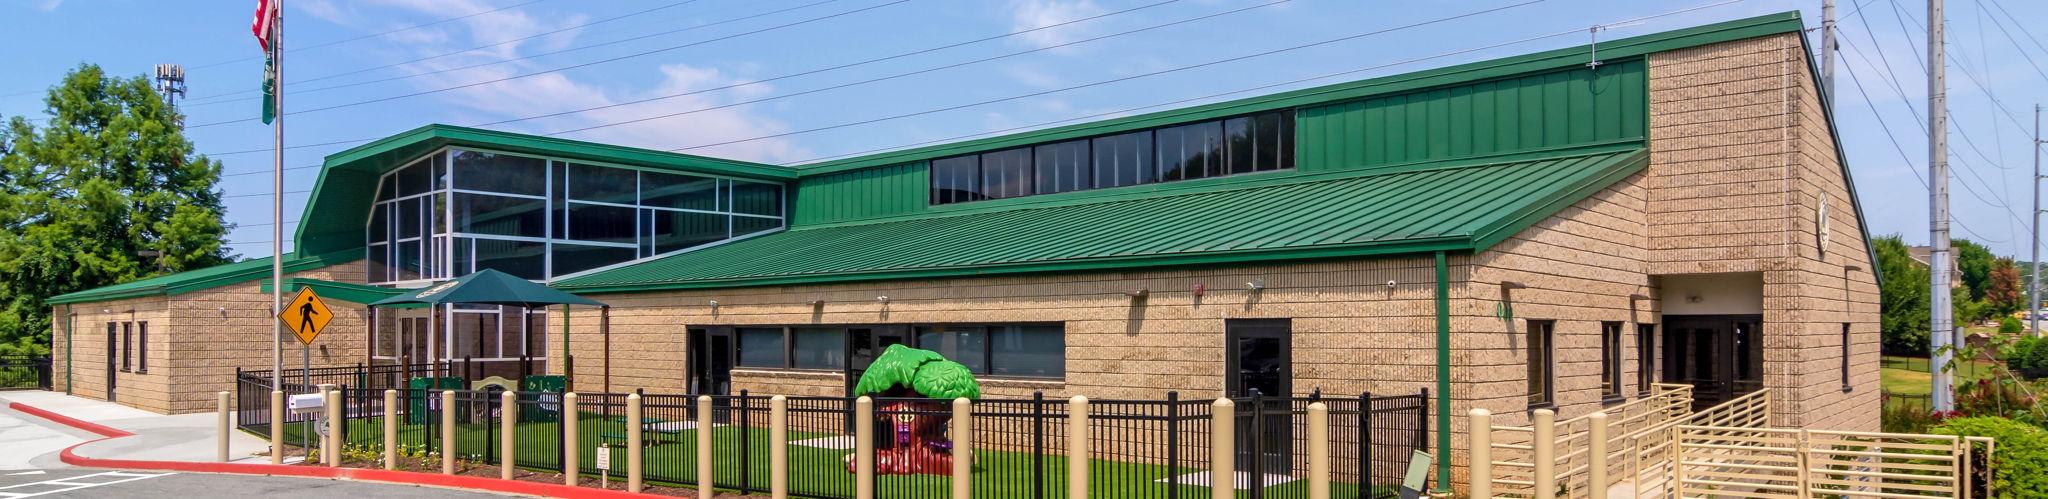 Exterior of Primrose School of Sandy Springs North